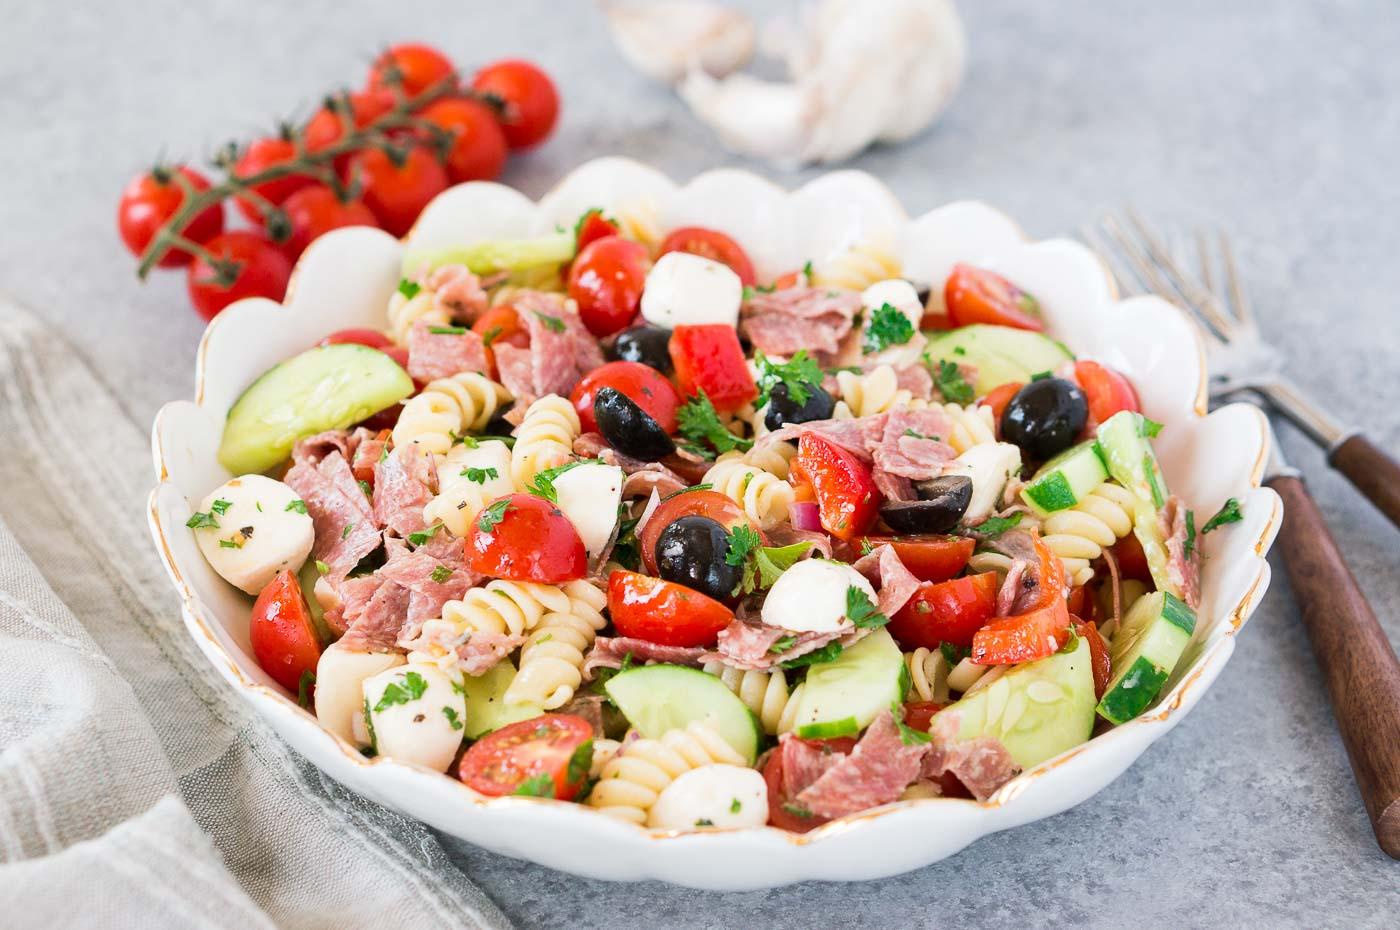 homemade pasta salad with tomatoes cucumbers salami and mozzarella